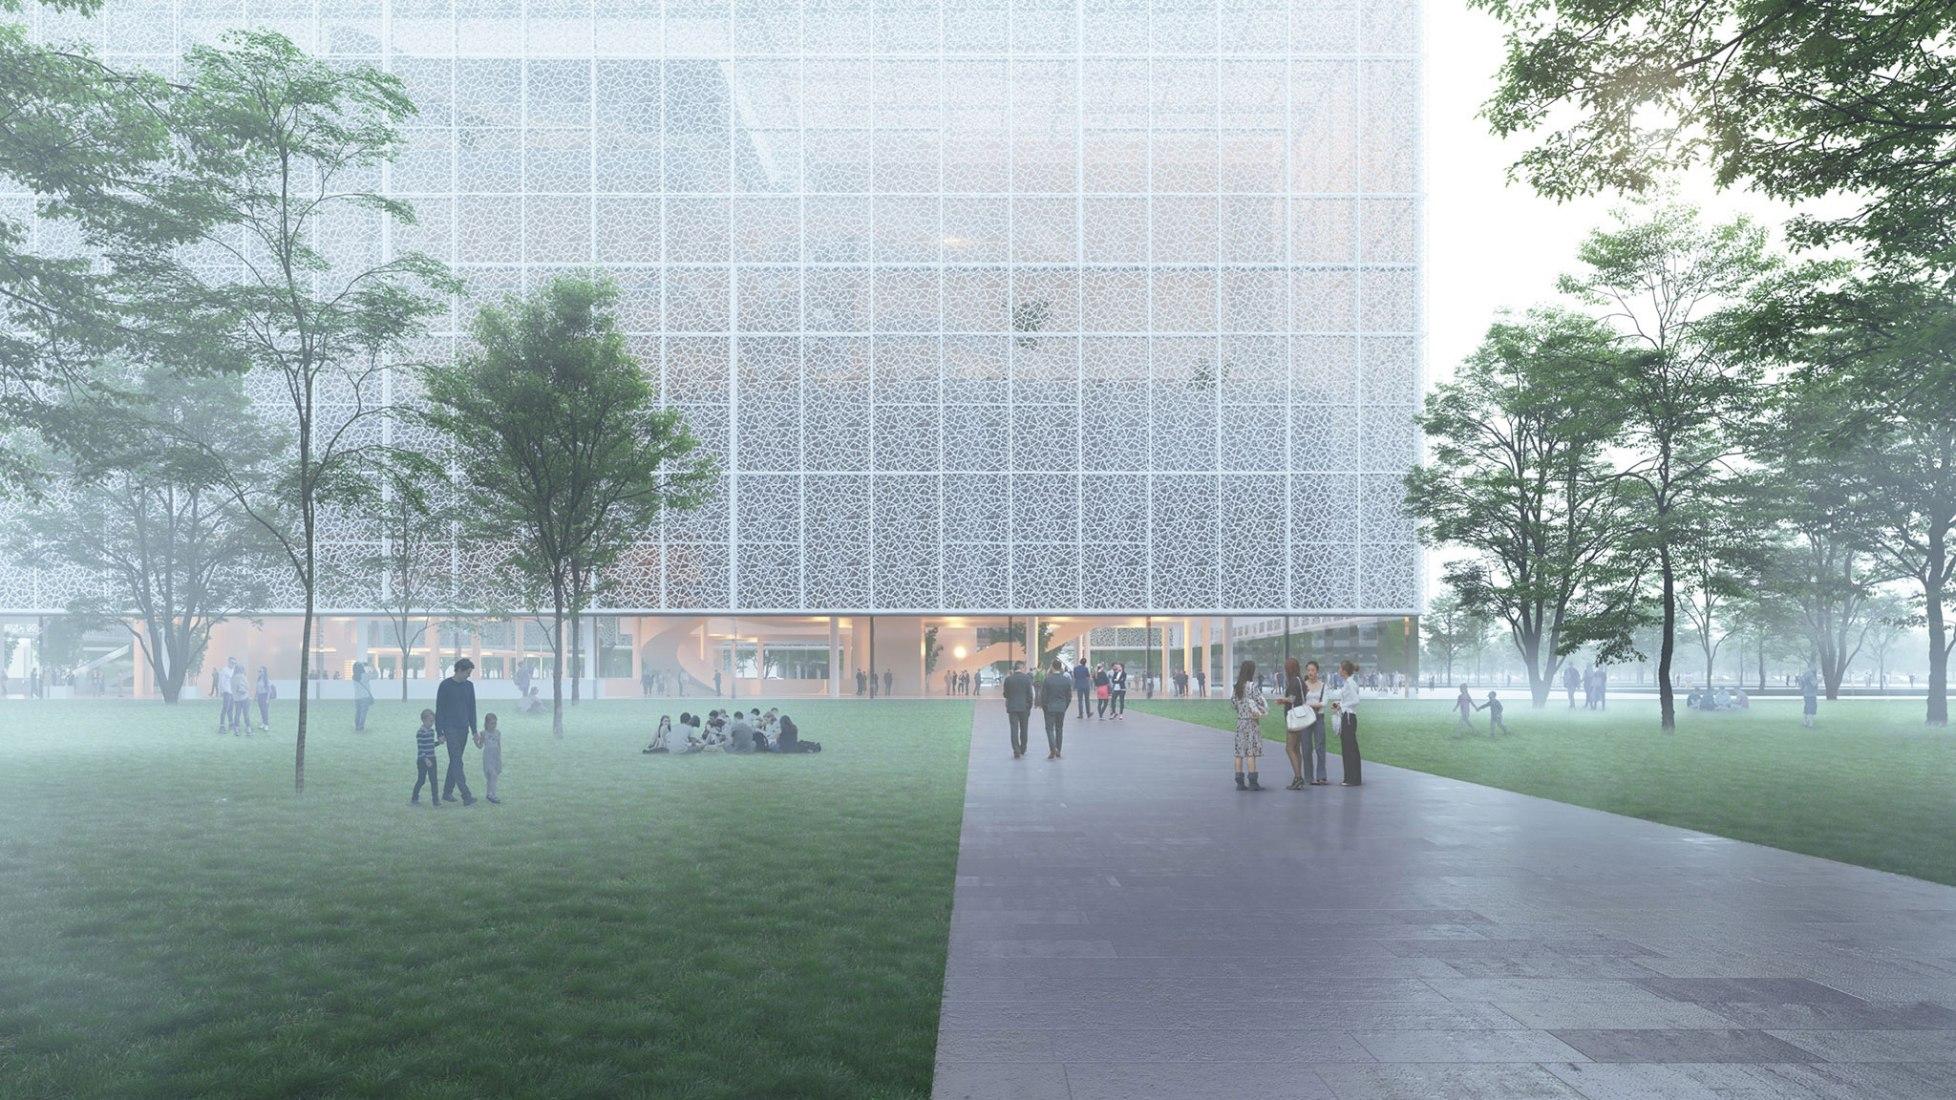 Renderings courtesy of Sou Fujimoto Architects.